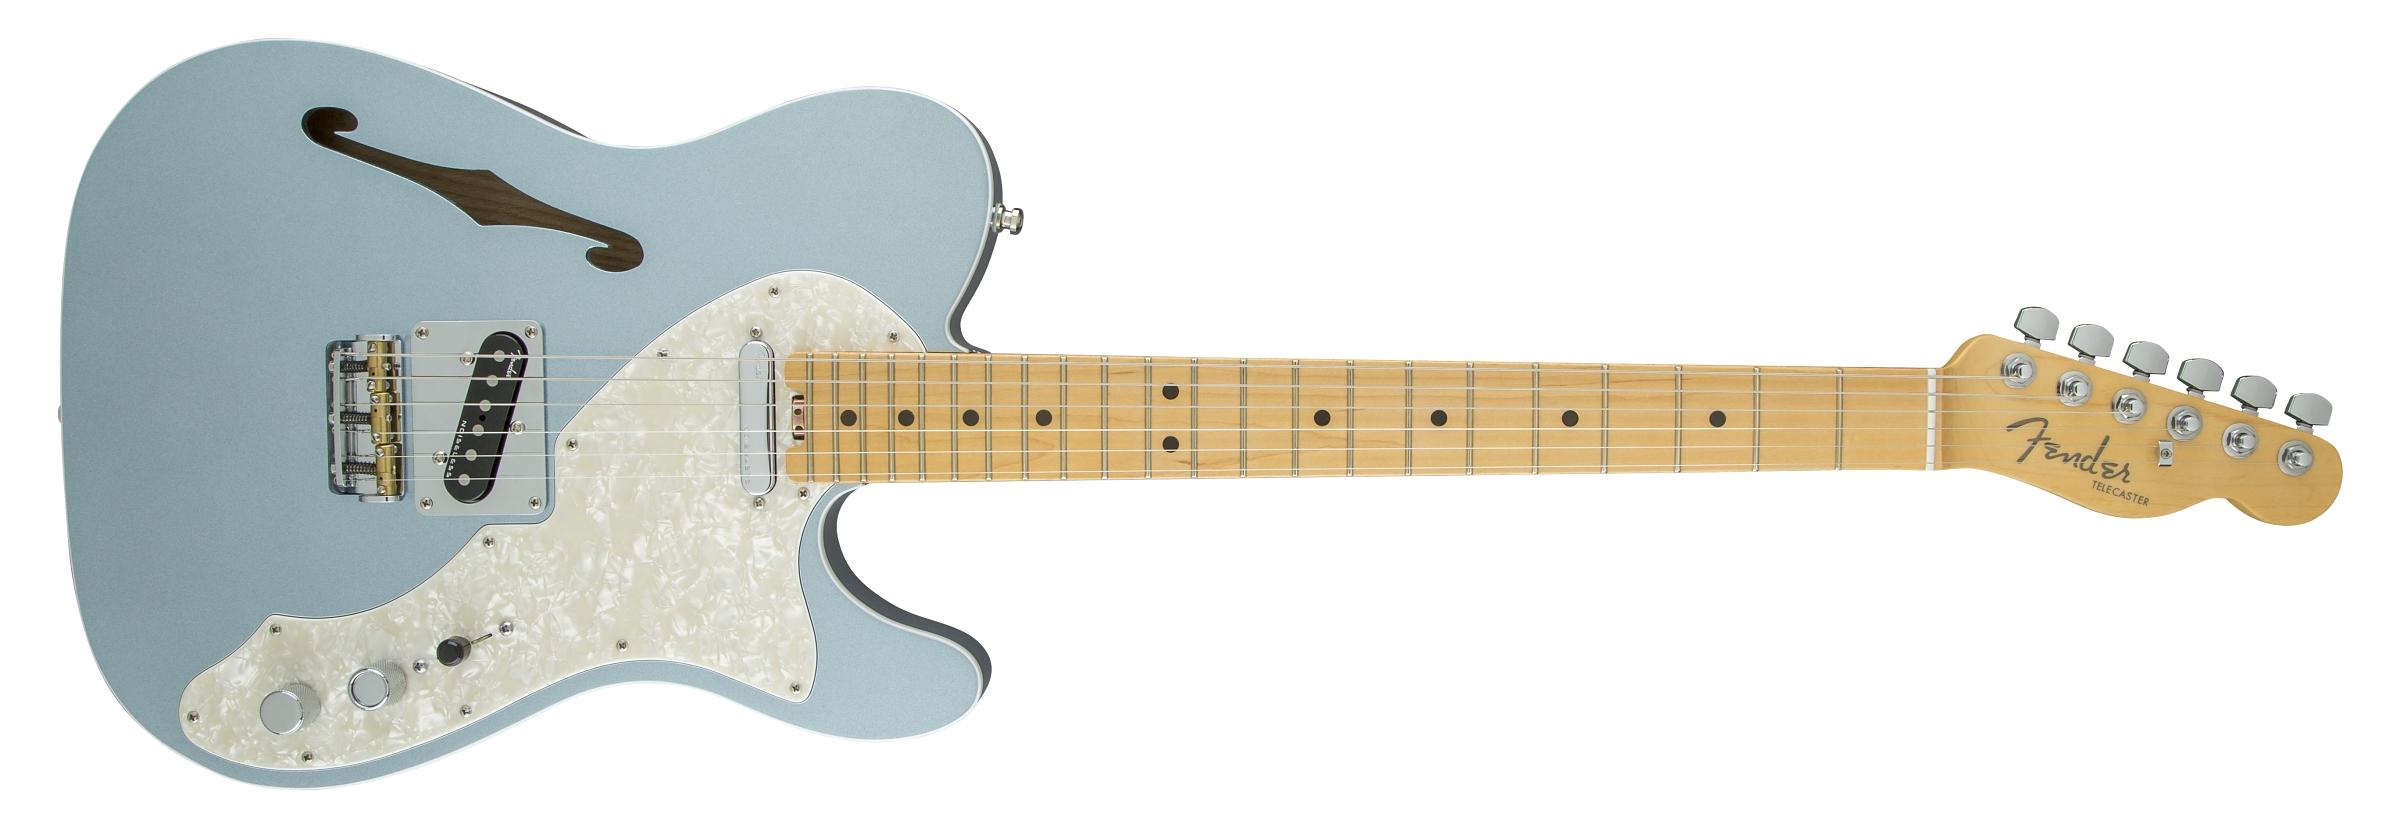 Fender american eilte telecaster thinline maple fingerboard american elite telecaster thinline mystic ice blue publicscrutiny Gallery